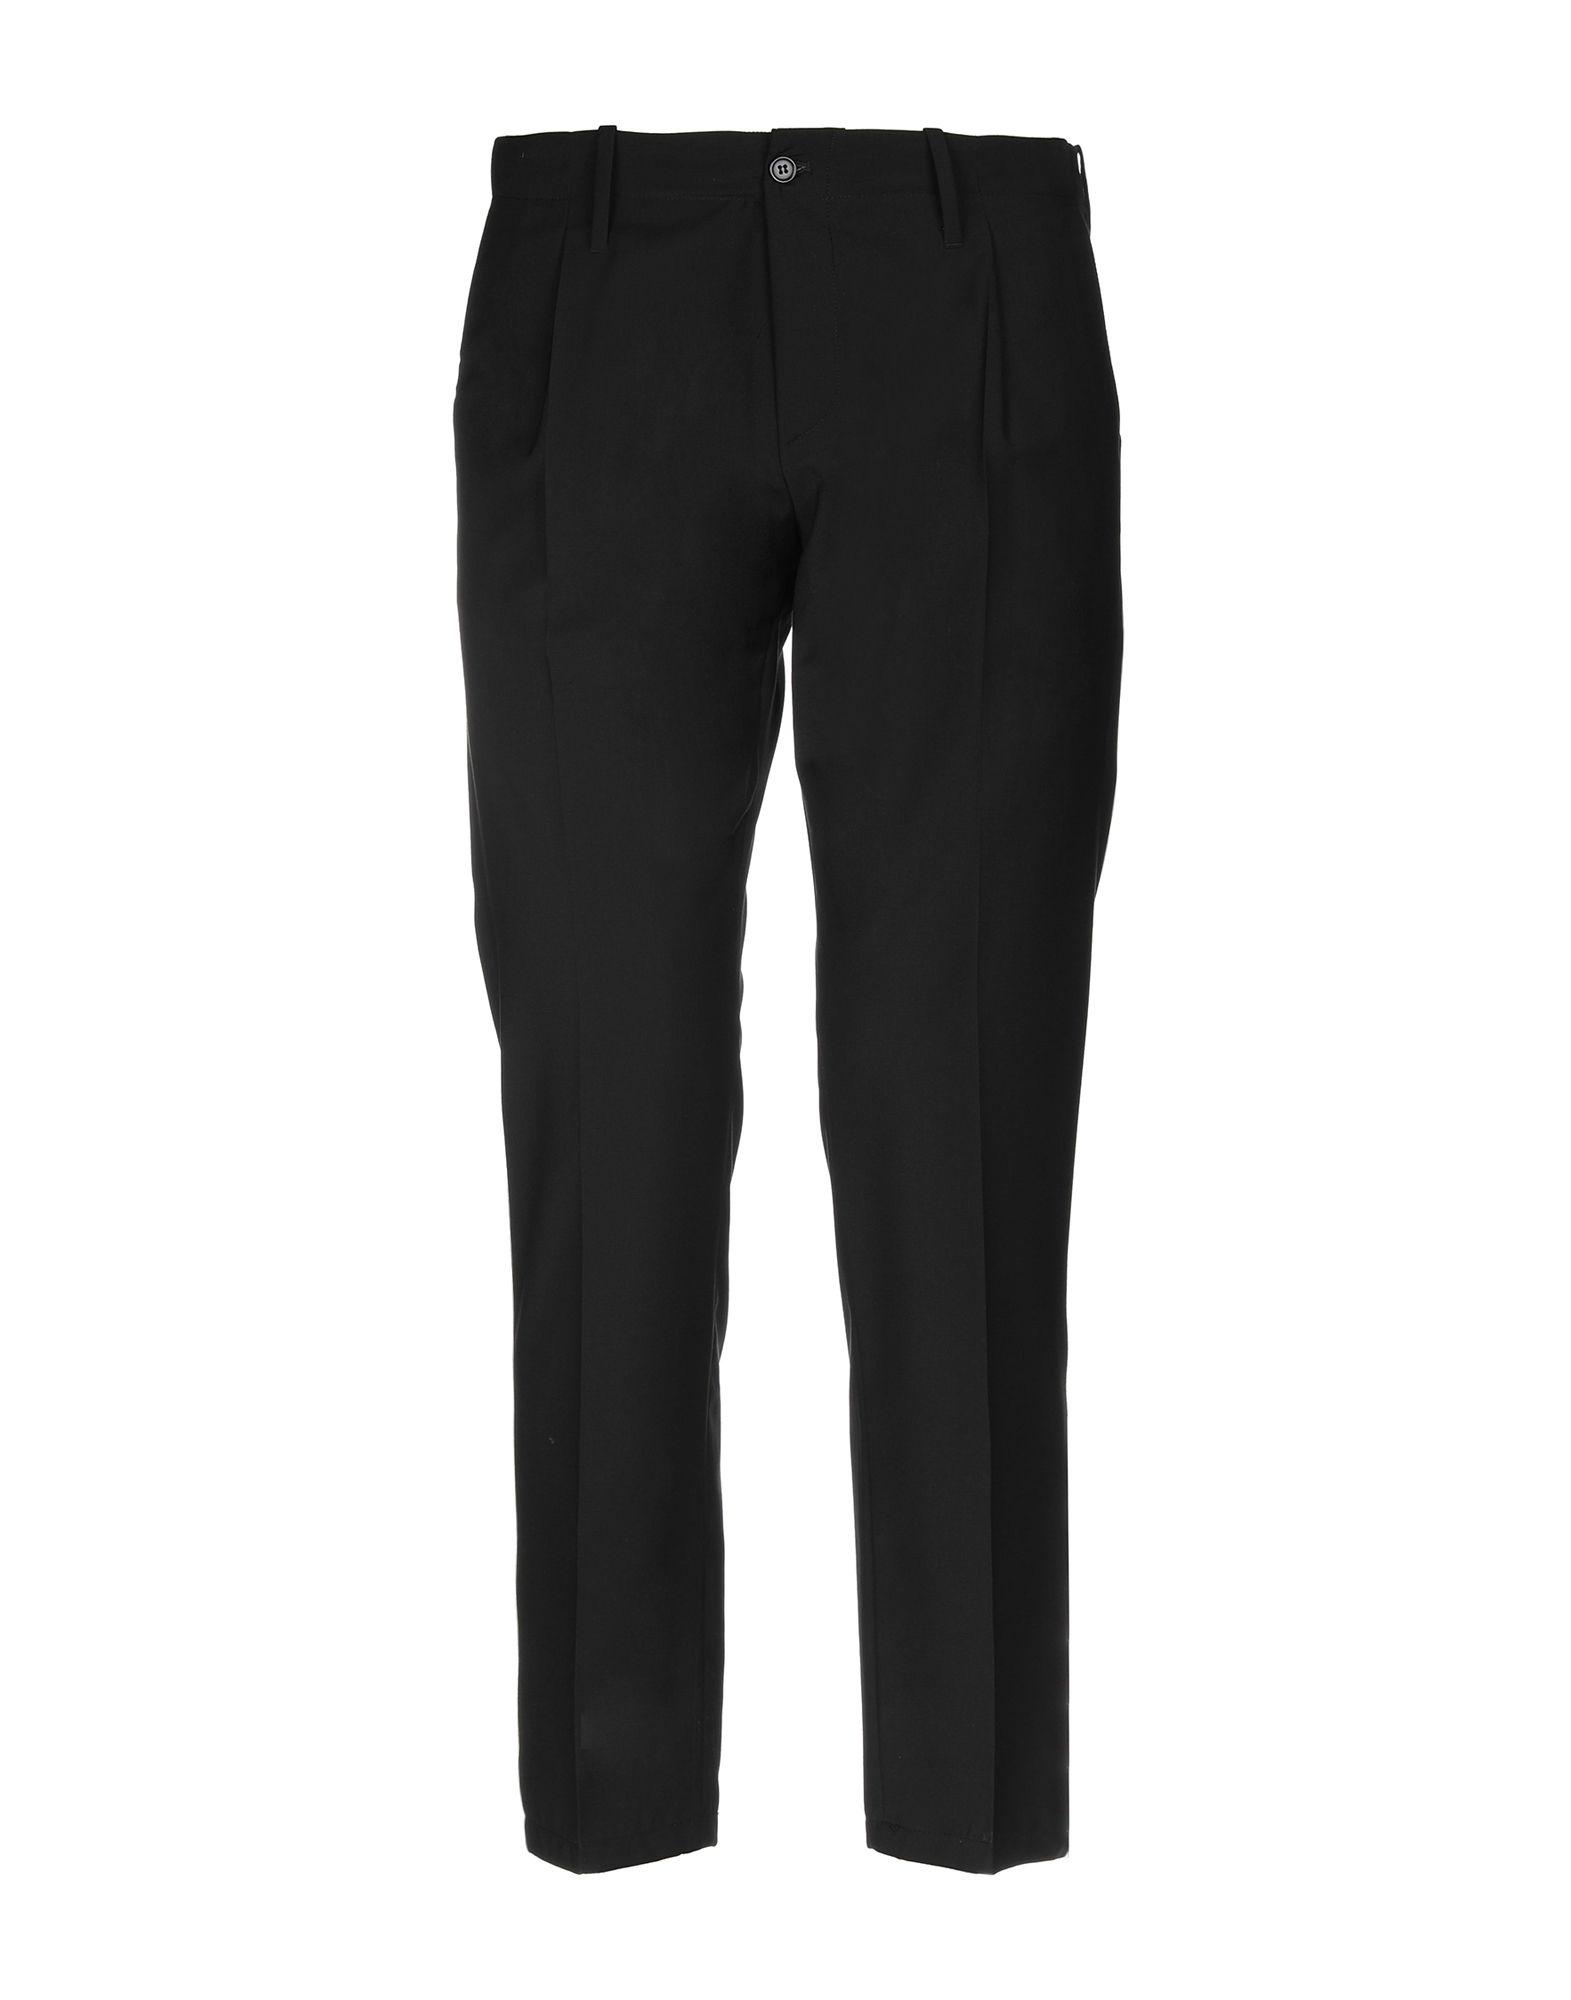 Pantalone Pantalone Dewin uomo - 13244770NM  Rabatte kaufen